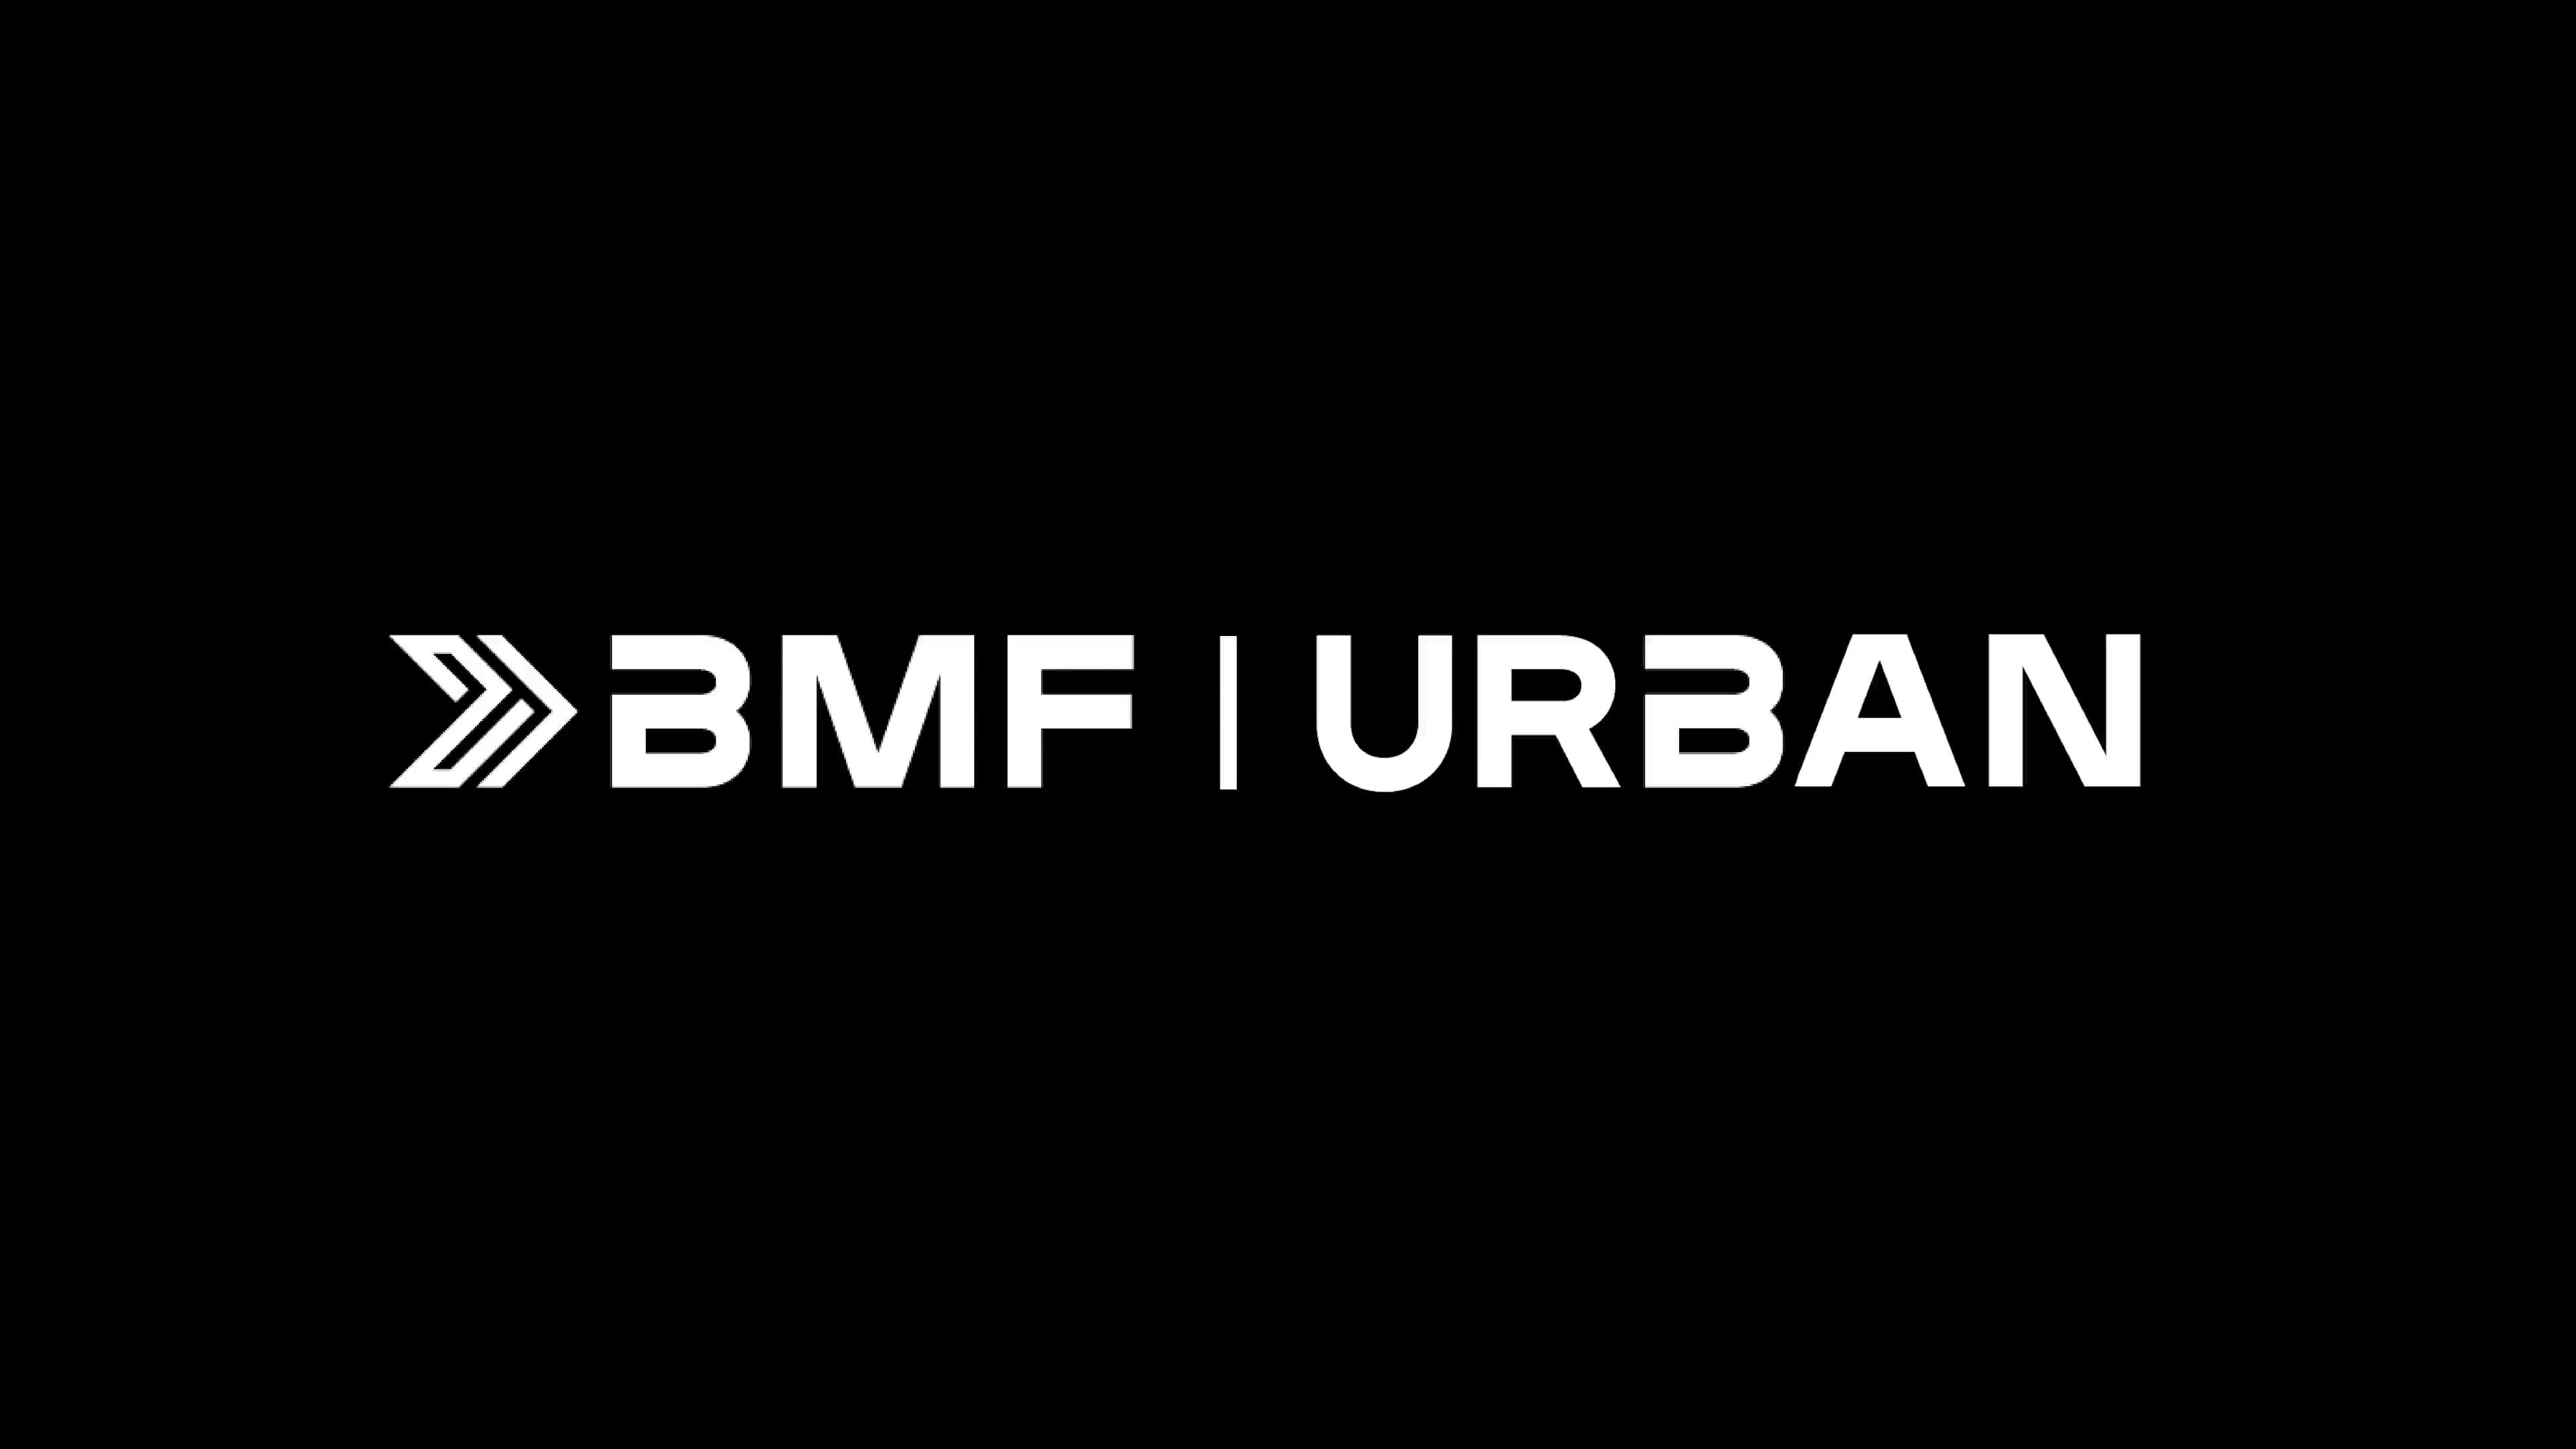 BMF URBAN [BLACK & WHITE]